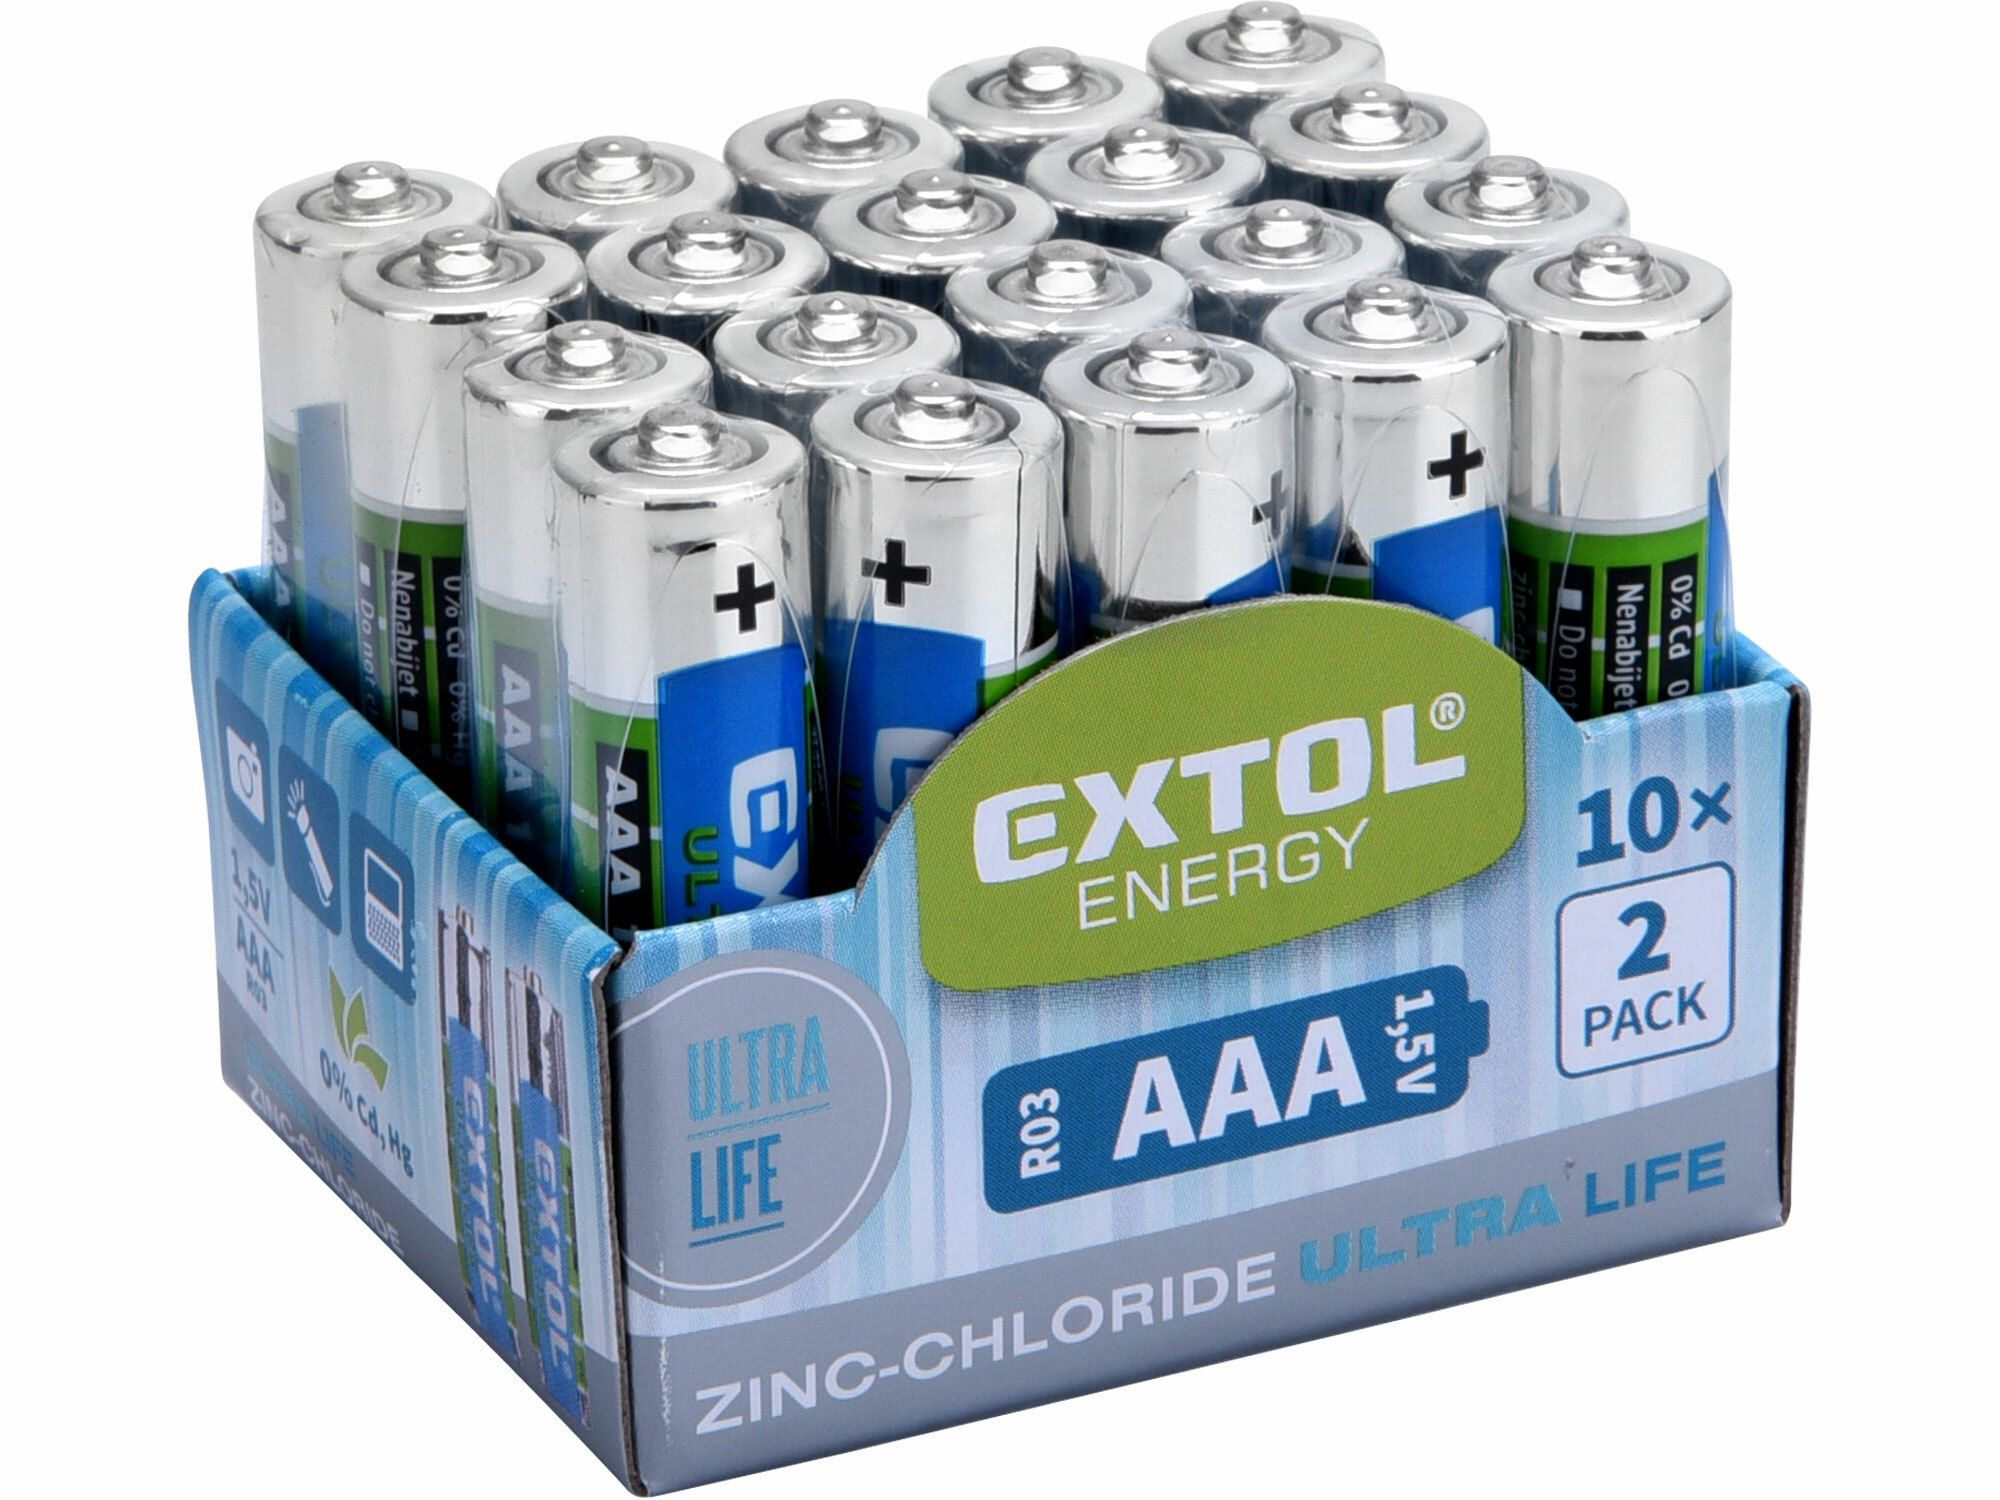 Baterie zink-chloridové, 20ks, 1,5V AAA (R03) EXTOL-LIGHT